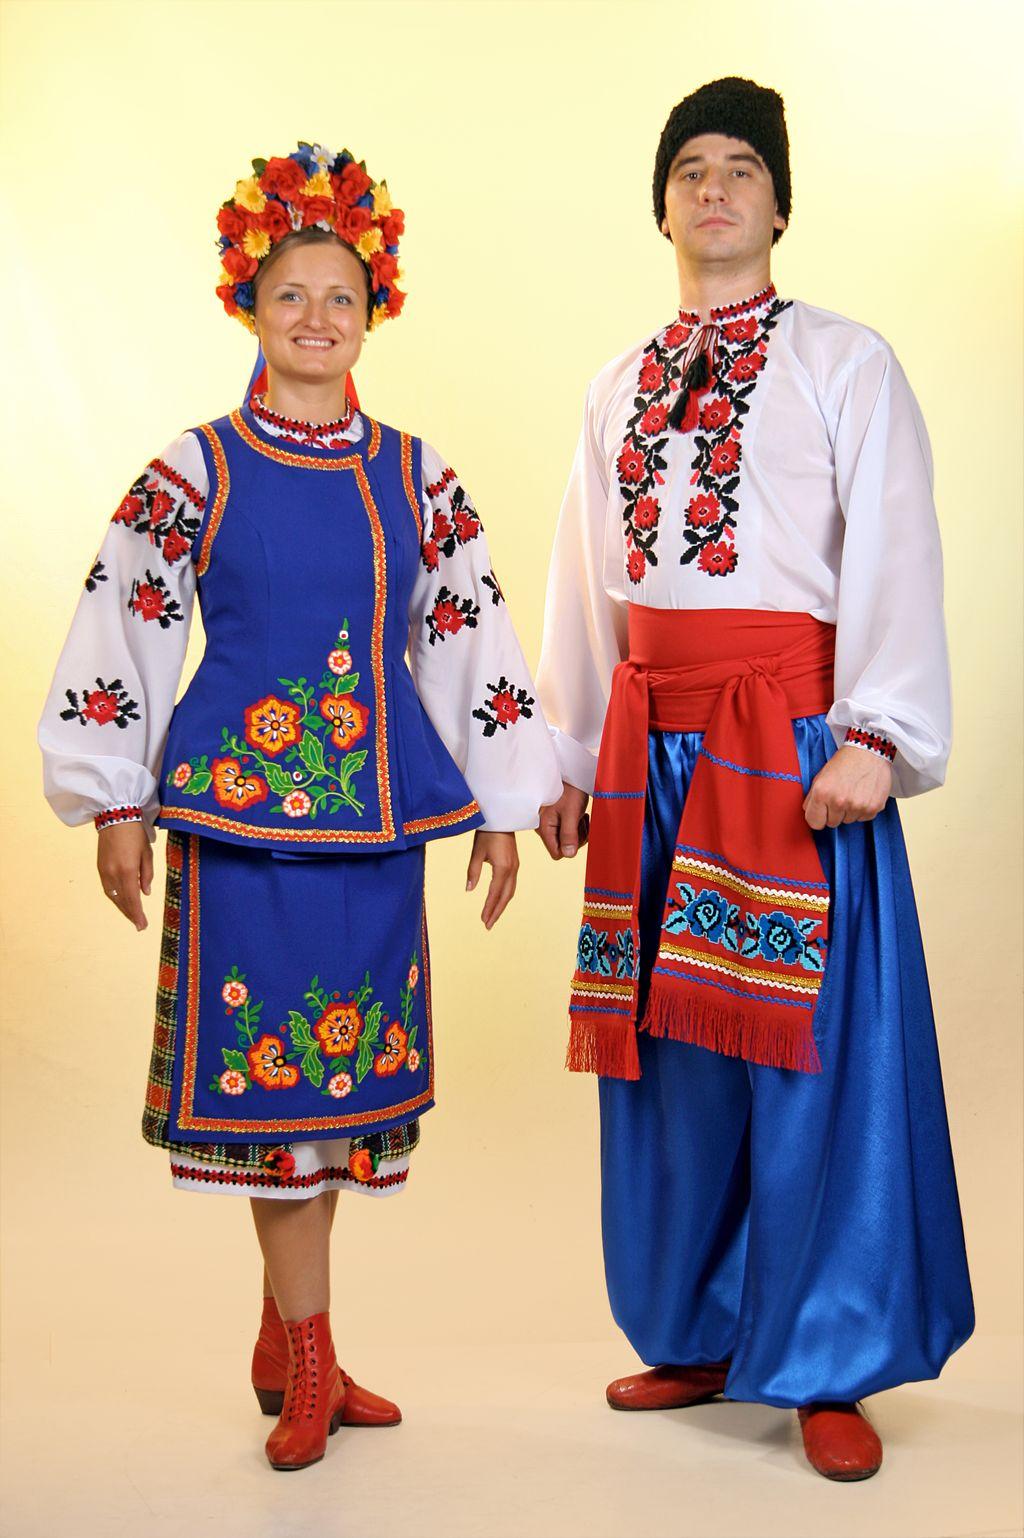 Український фольклор  Український національний костюм a4d327123de33